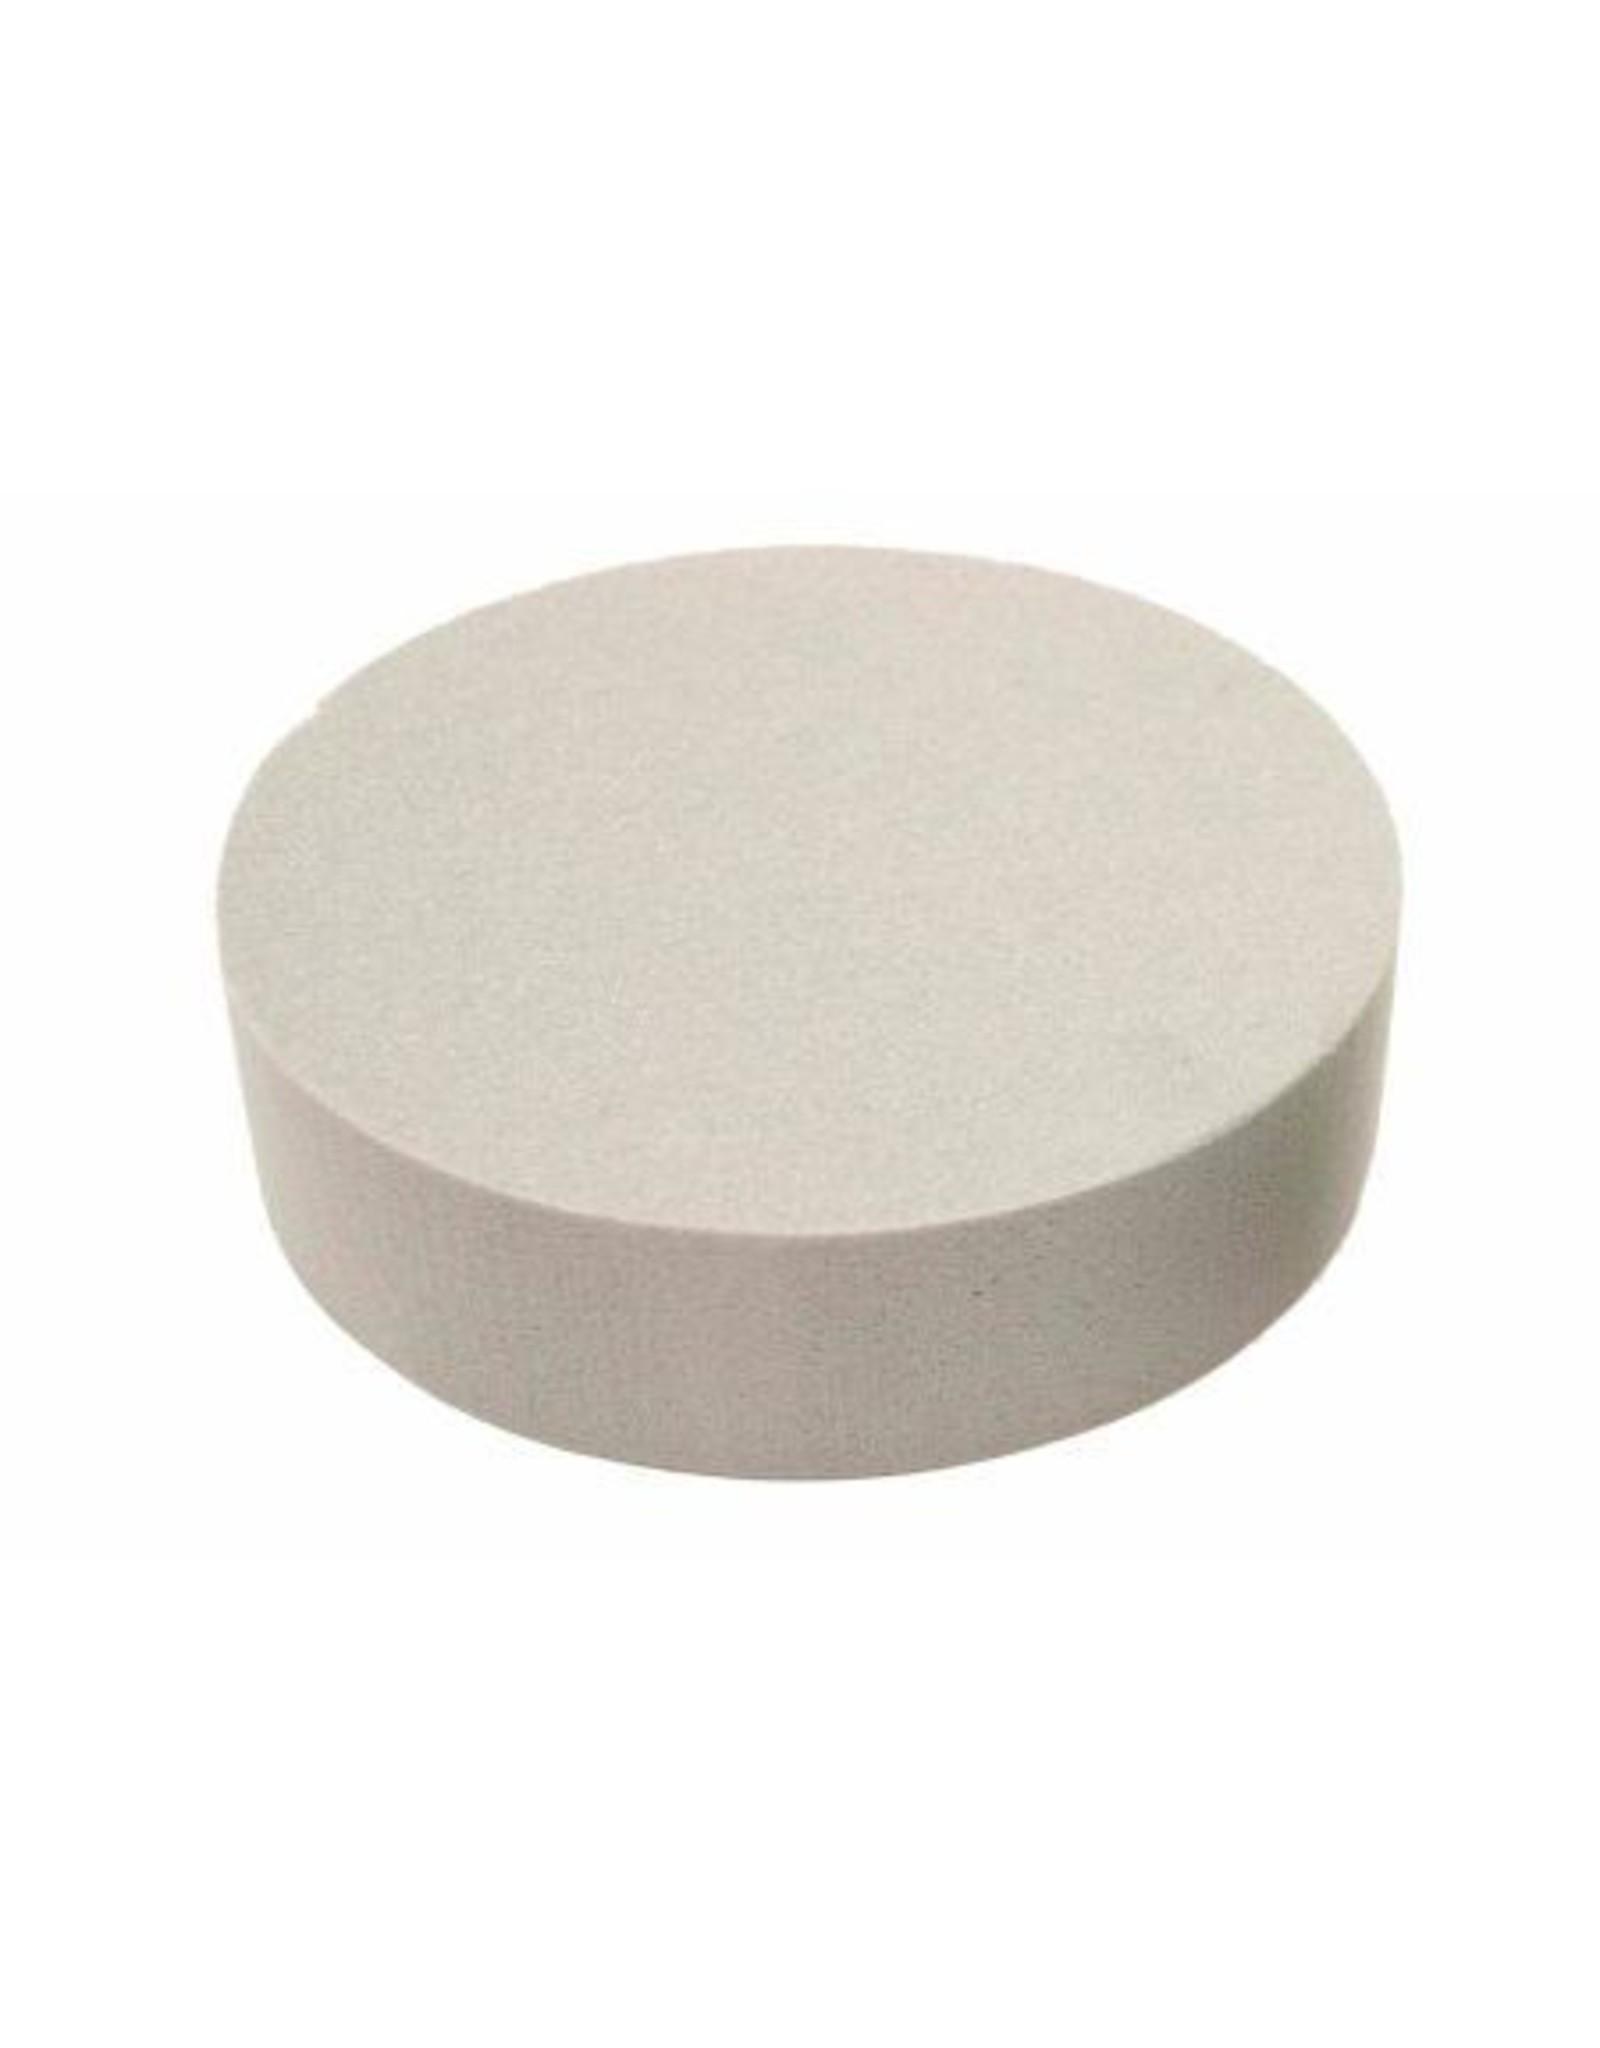 HD Basic Cake Dry Sld Foam D18.0h6.0 x 48